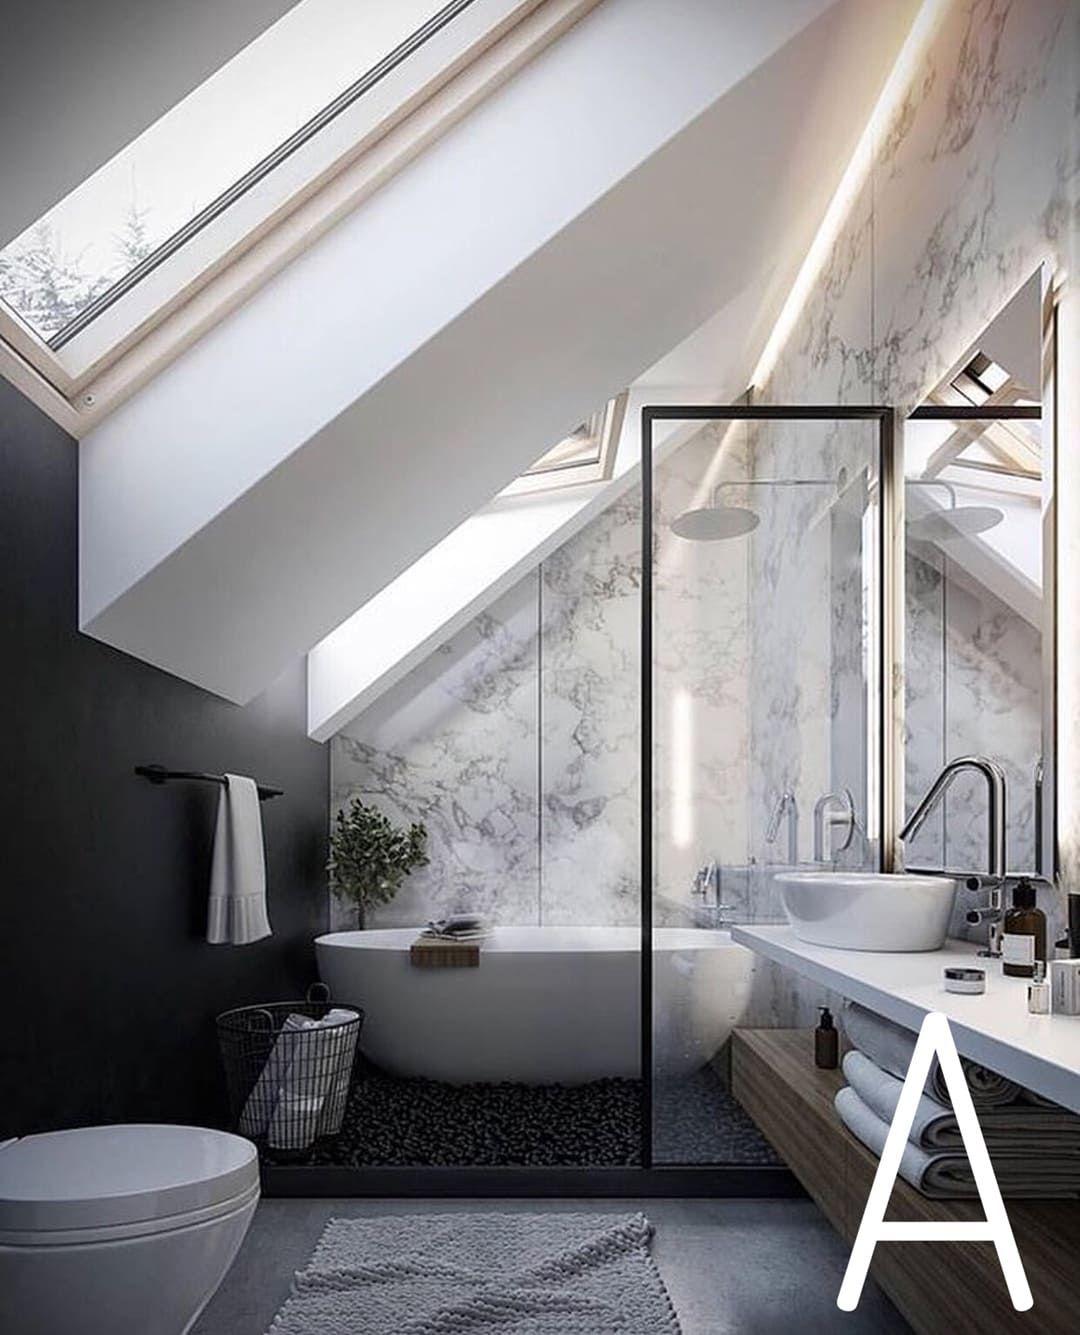 Minimal Interior Design Inspiration | 160